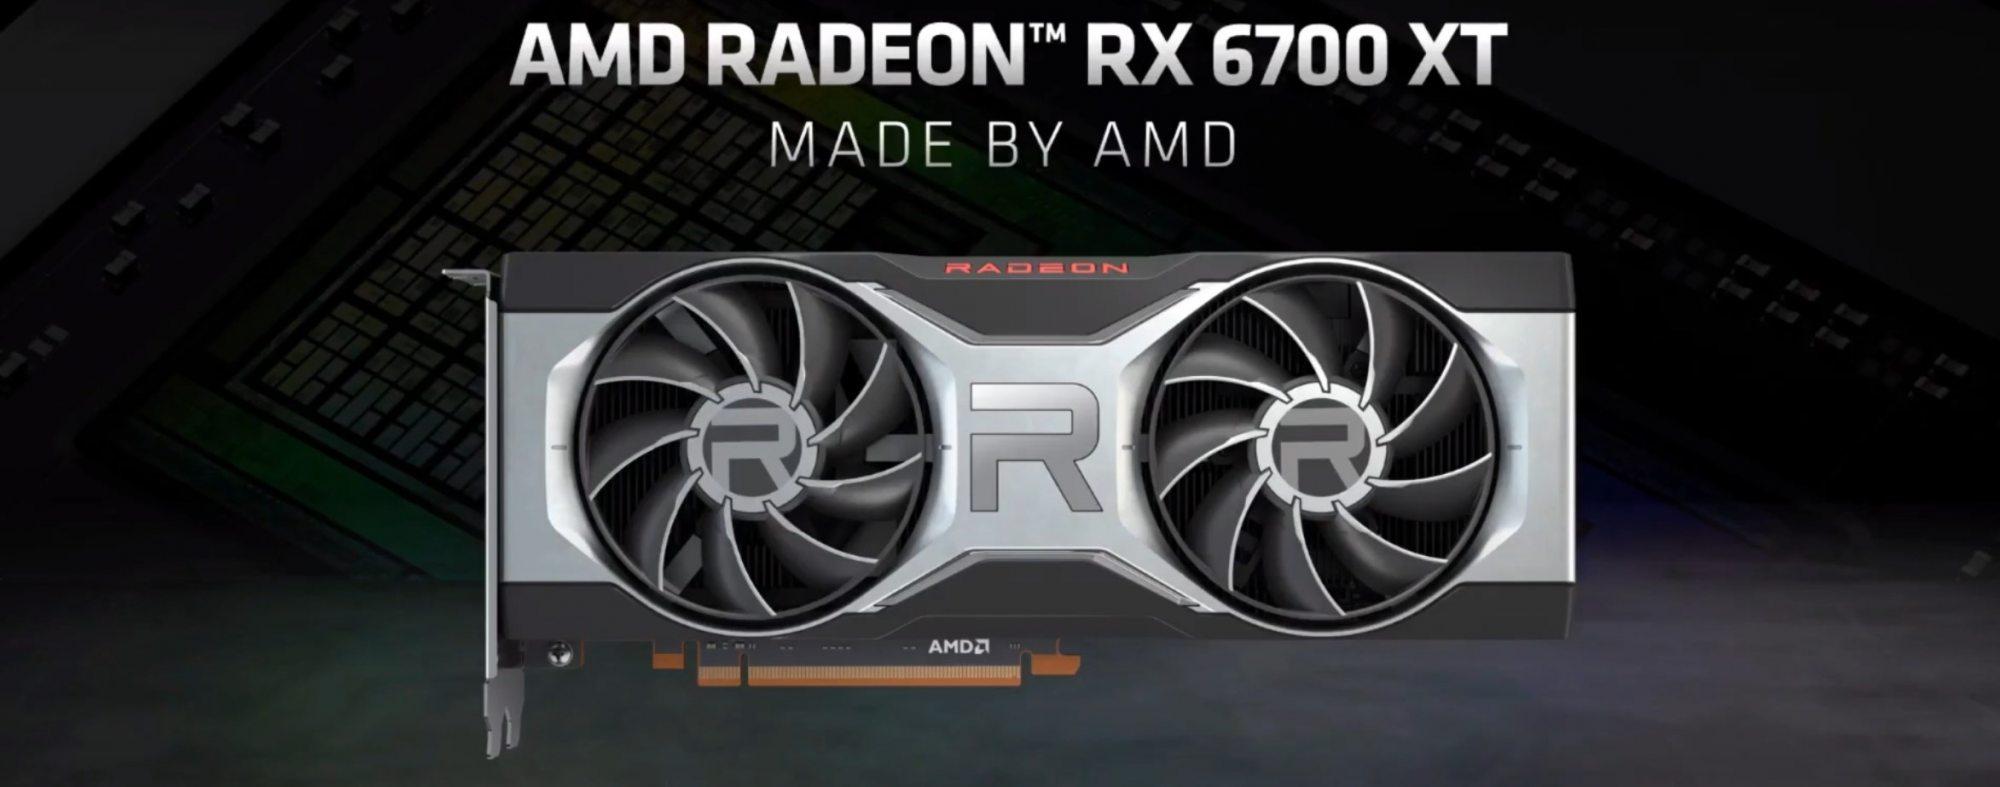 AMD RX 6700 XT graphic card